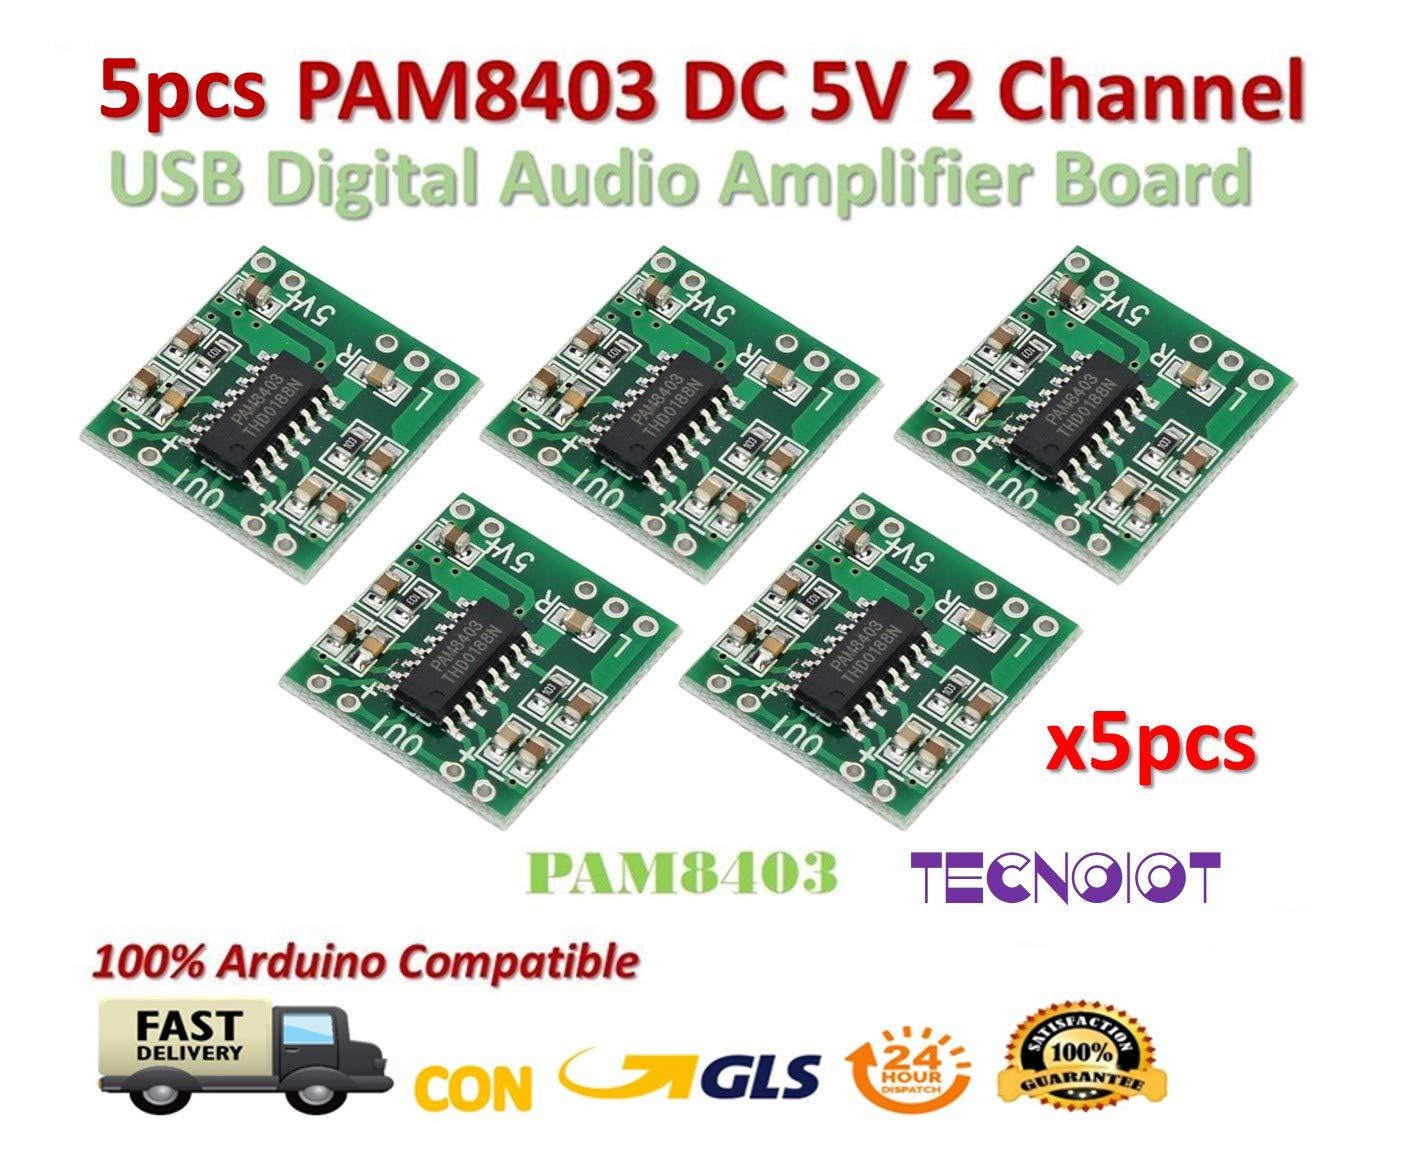 DCA75 Peak Atlas DCA Pro avanzate Semiconductor Tester Meter jpst 007 vatinvoice